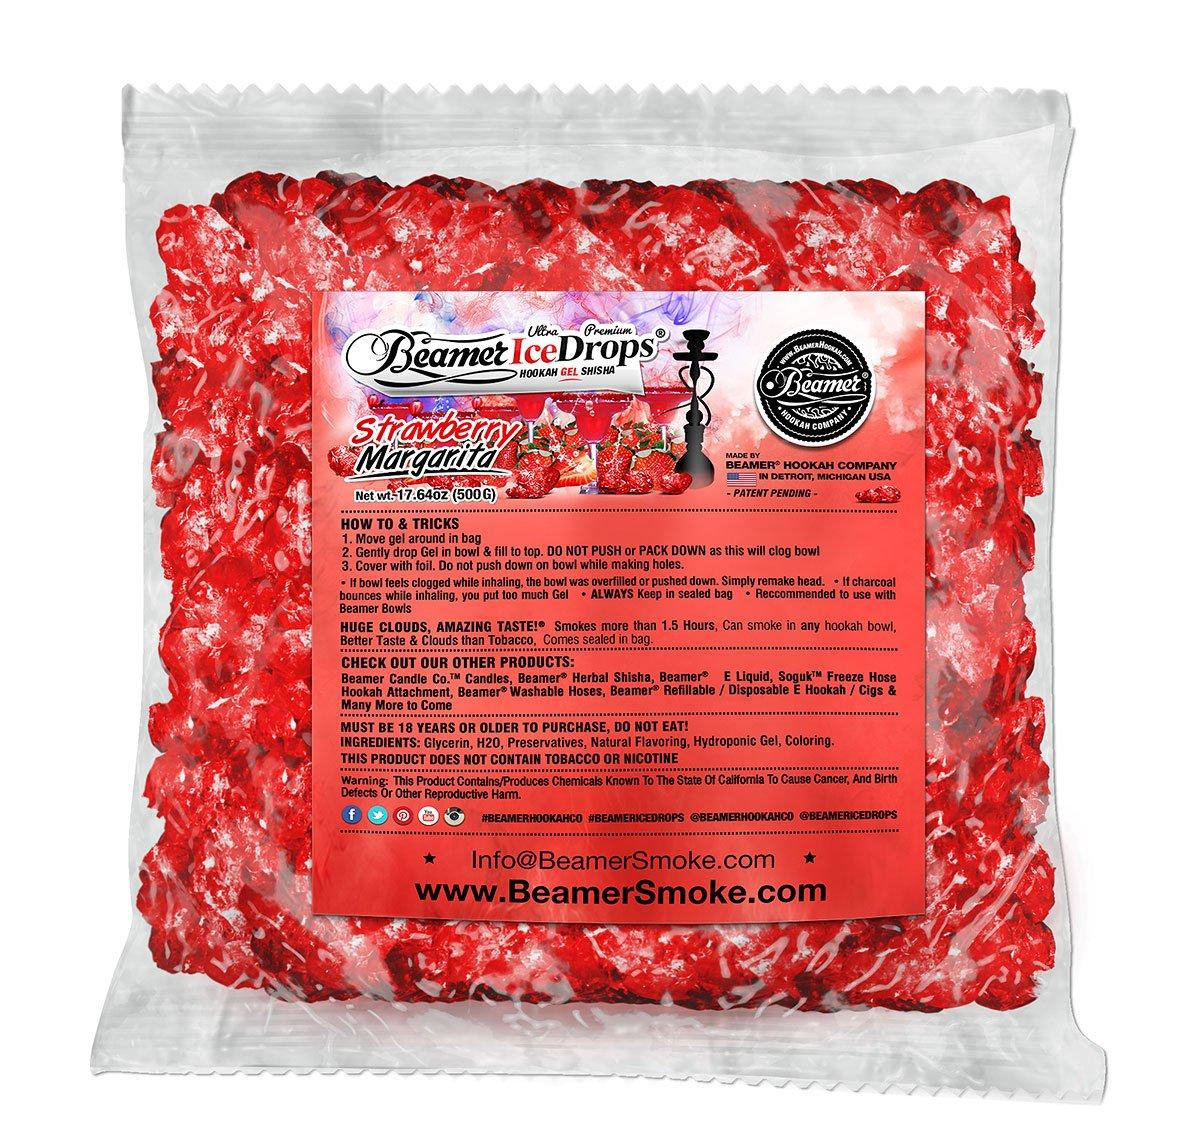 StrawBerry Margarita 1000G Ultra Premium Beamer Ice Drops Hookah Shisha Smoking Gel. Each bowl lasts 2-4 Hours! USA Made, Huge Clouds, Amazing Taste! Better Taste & Clouds than Tobacco!